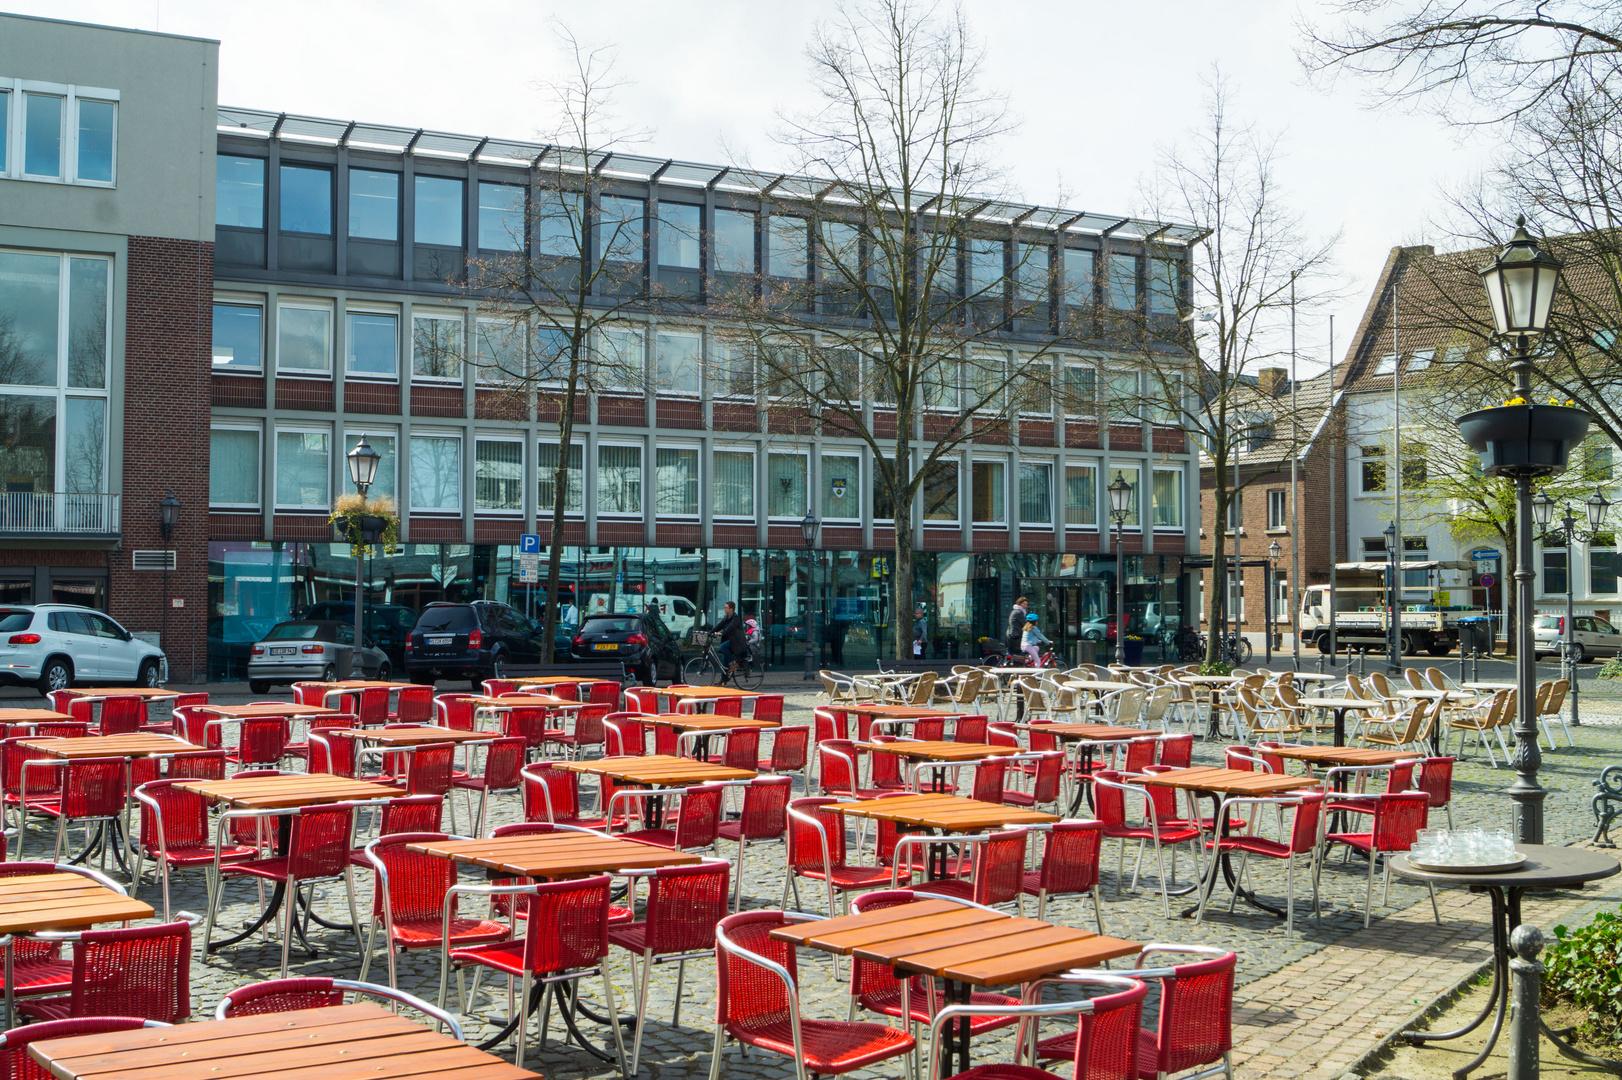 Rathausplatz Erkelenz